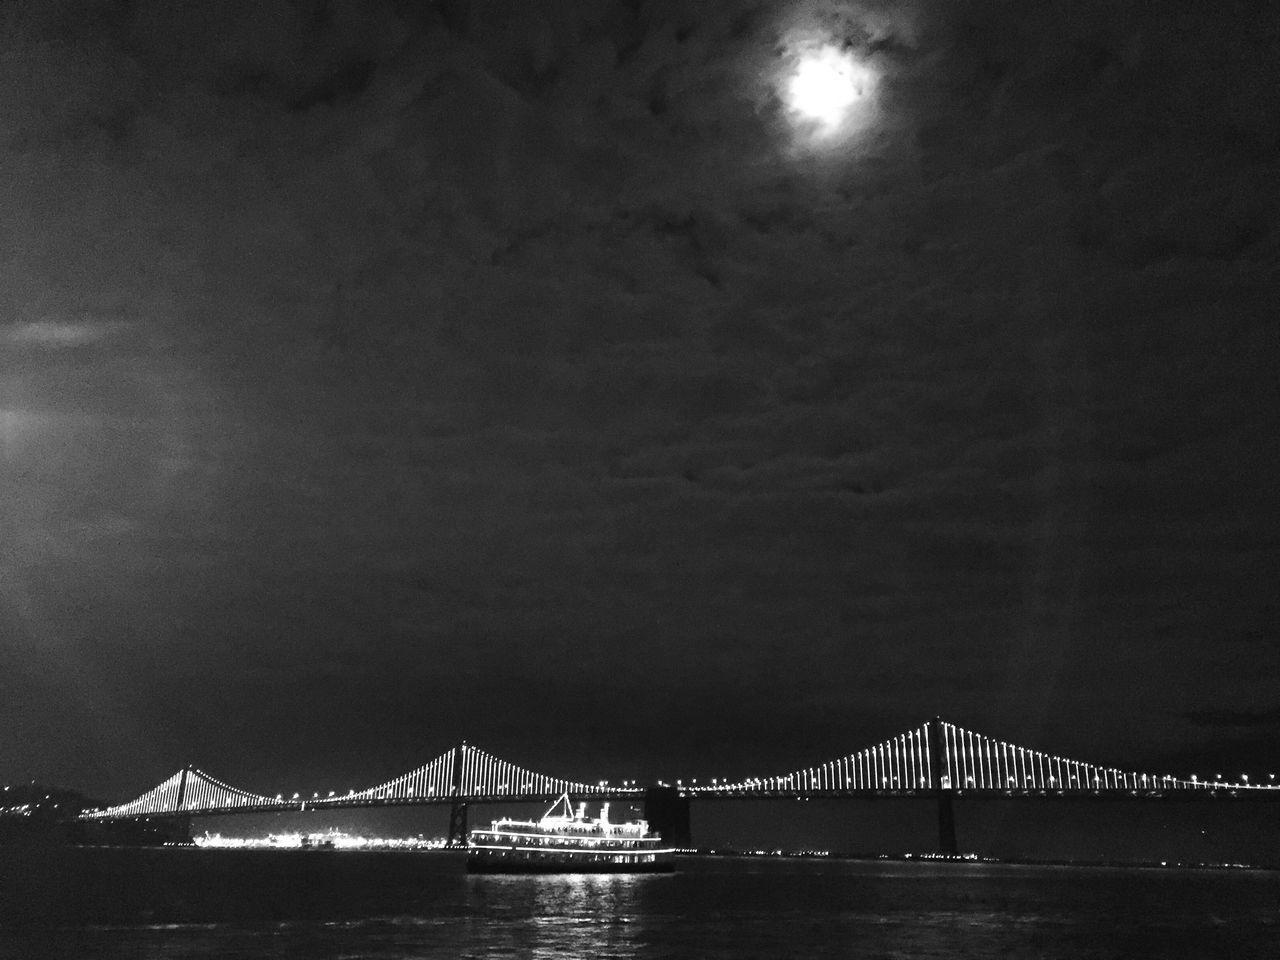 Bay Bridge San Francisco Bay Bridge San Francisco City Lights Night Lights Night Photography Embarcadero Waterfront Carlifornia USAtrip Black & White Blackandwhite